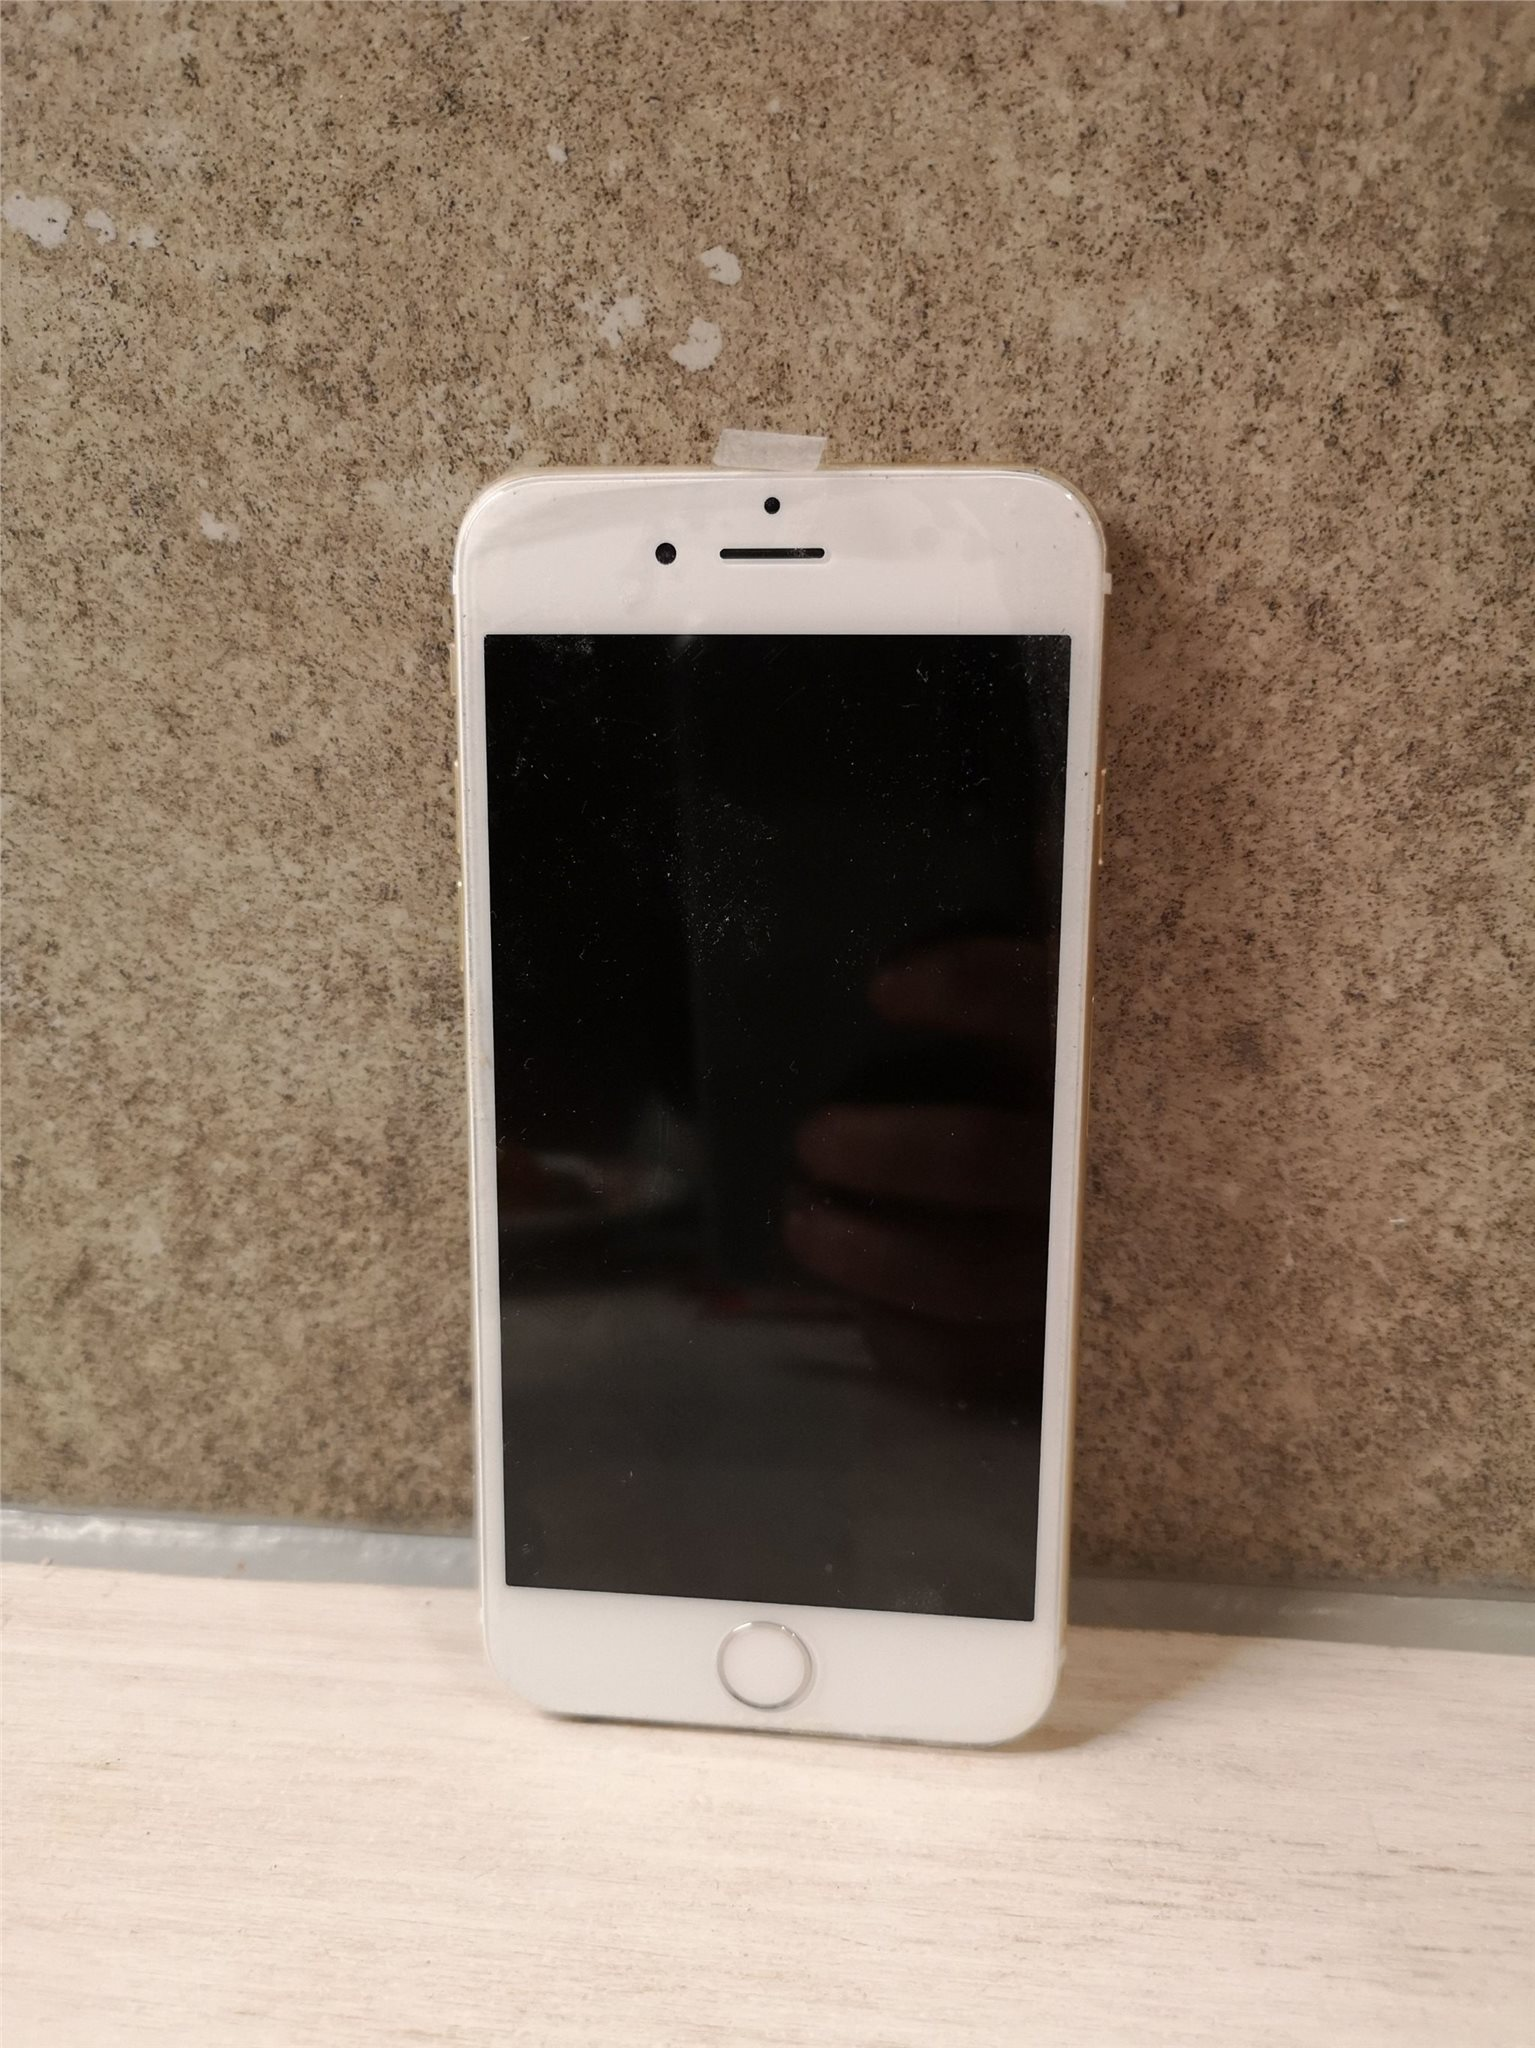 iphone 6s - 64gb - guld - ny skärm - kanonbra b.. (342274259) ᐈ Köp ... a7c18f10eab1c